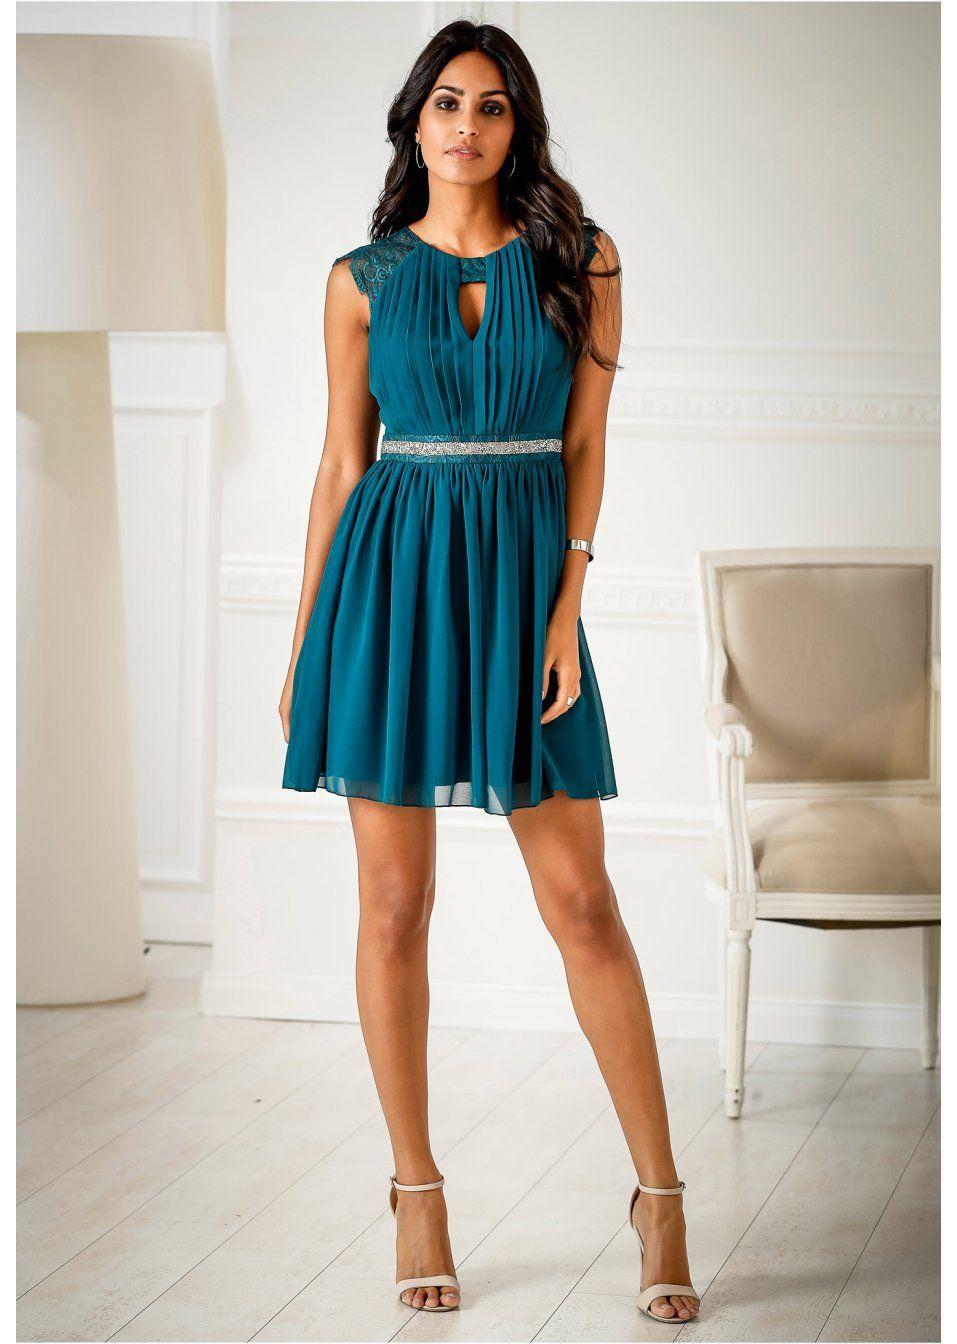 Koktajlowa Sukienka Z Brokatem Zielona Http Fashion4u Pl Koktajlowa Sukienka Z Brokatem Zielona Sukienka Na Wesele Mini Dress Fashion Dresses